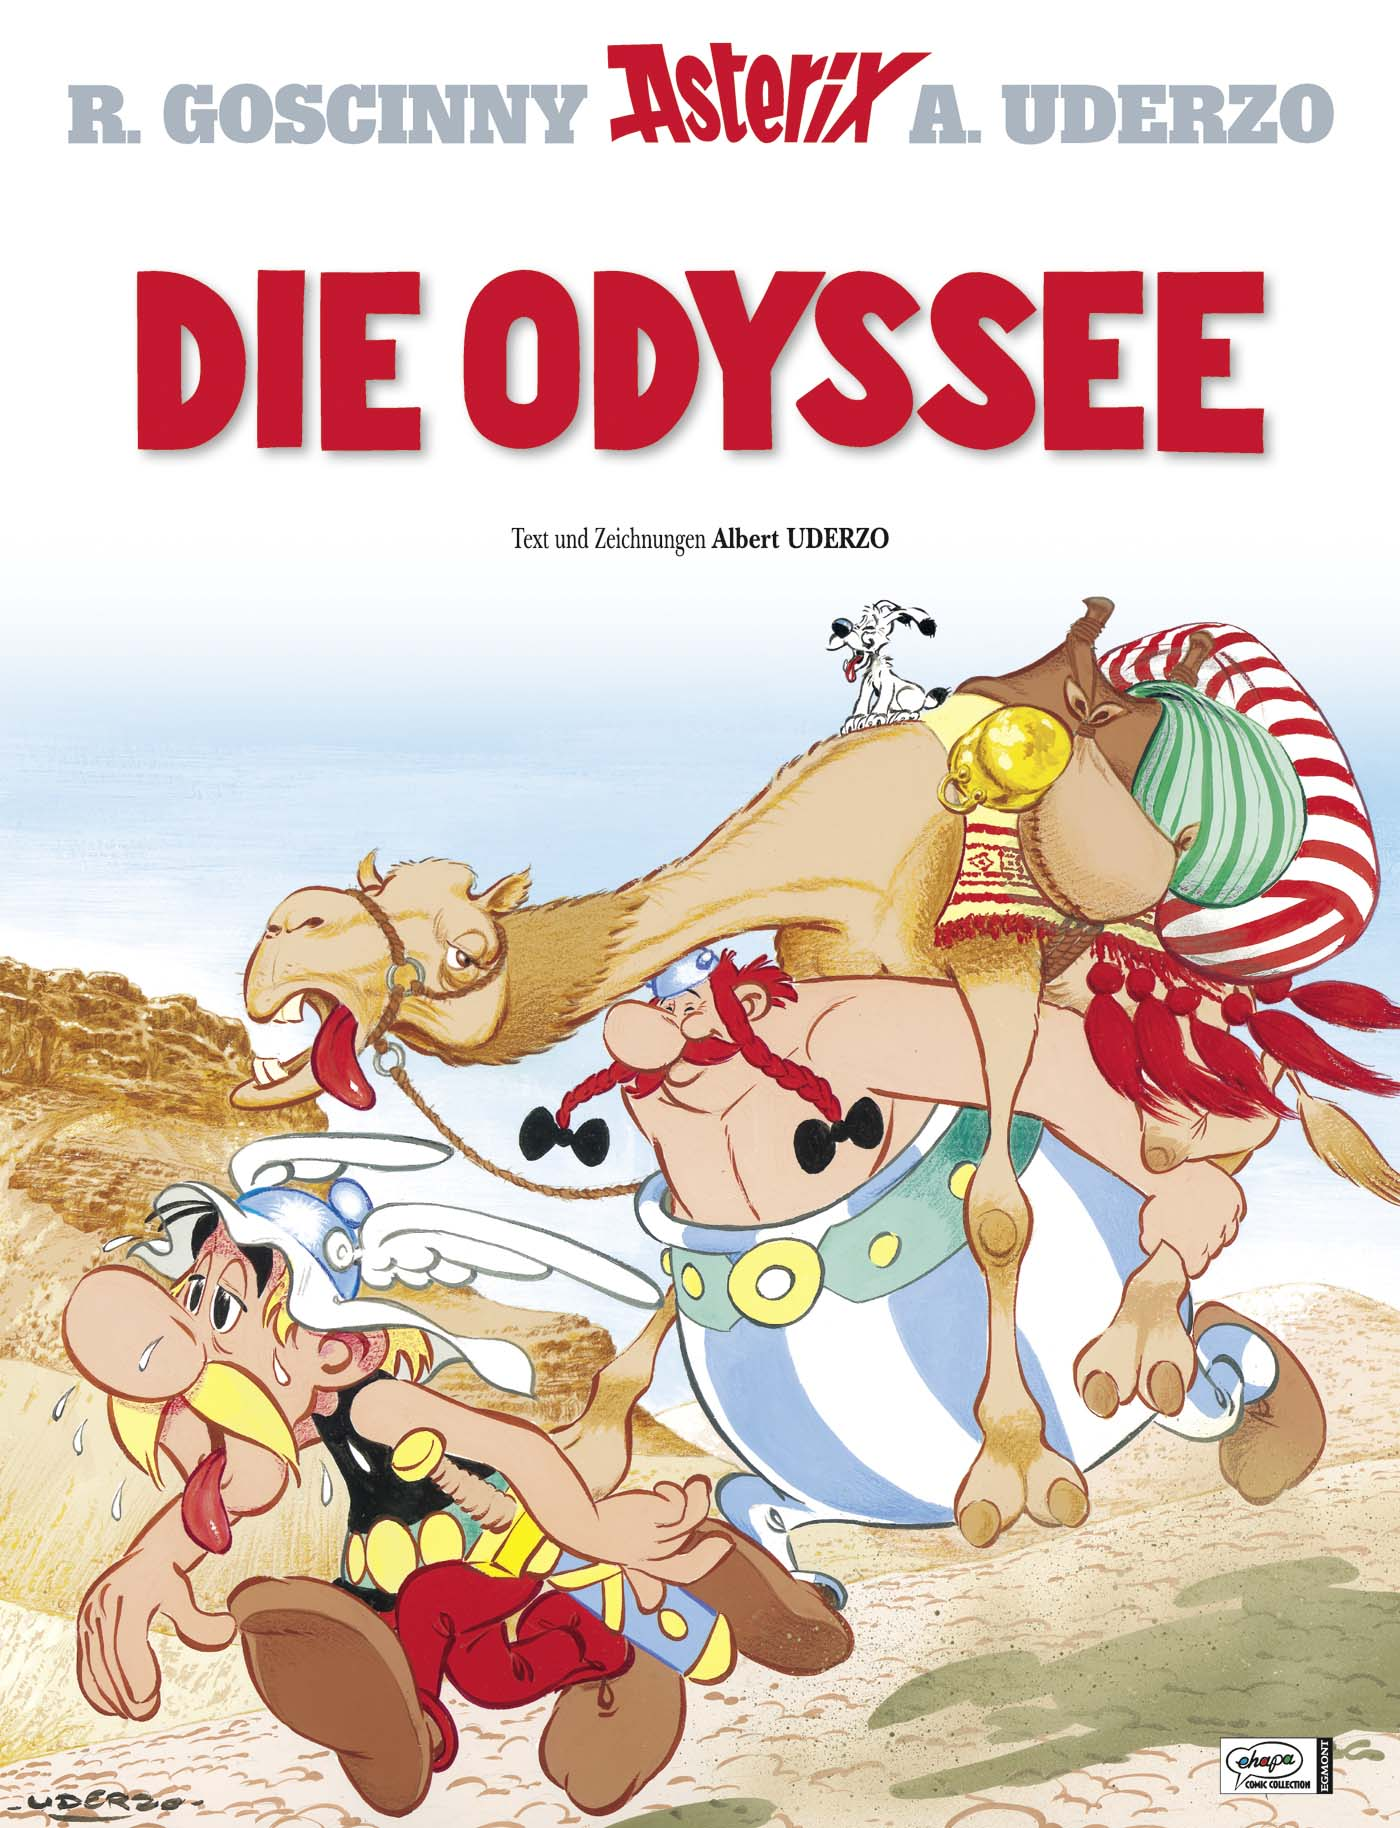 Asterix: Band 26 - Die Odyssee - R. Goscinny & A. Uderzo [Gebundene Ausgabe]